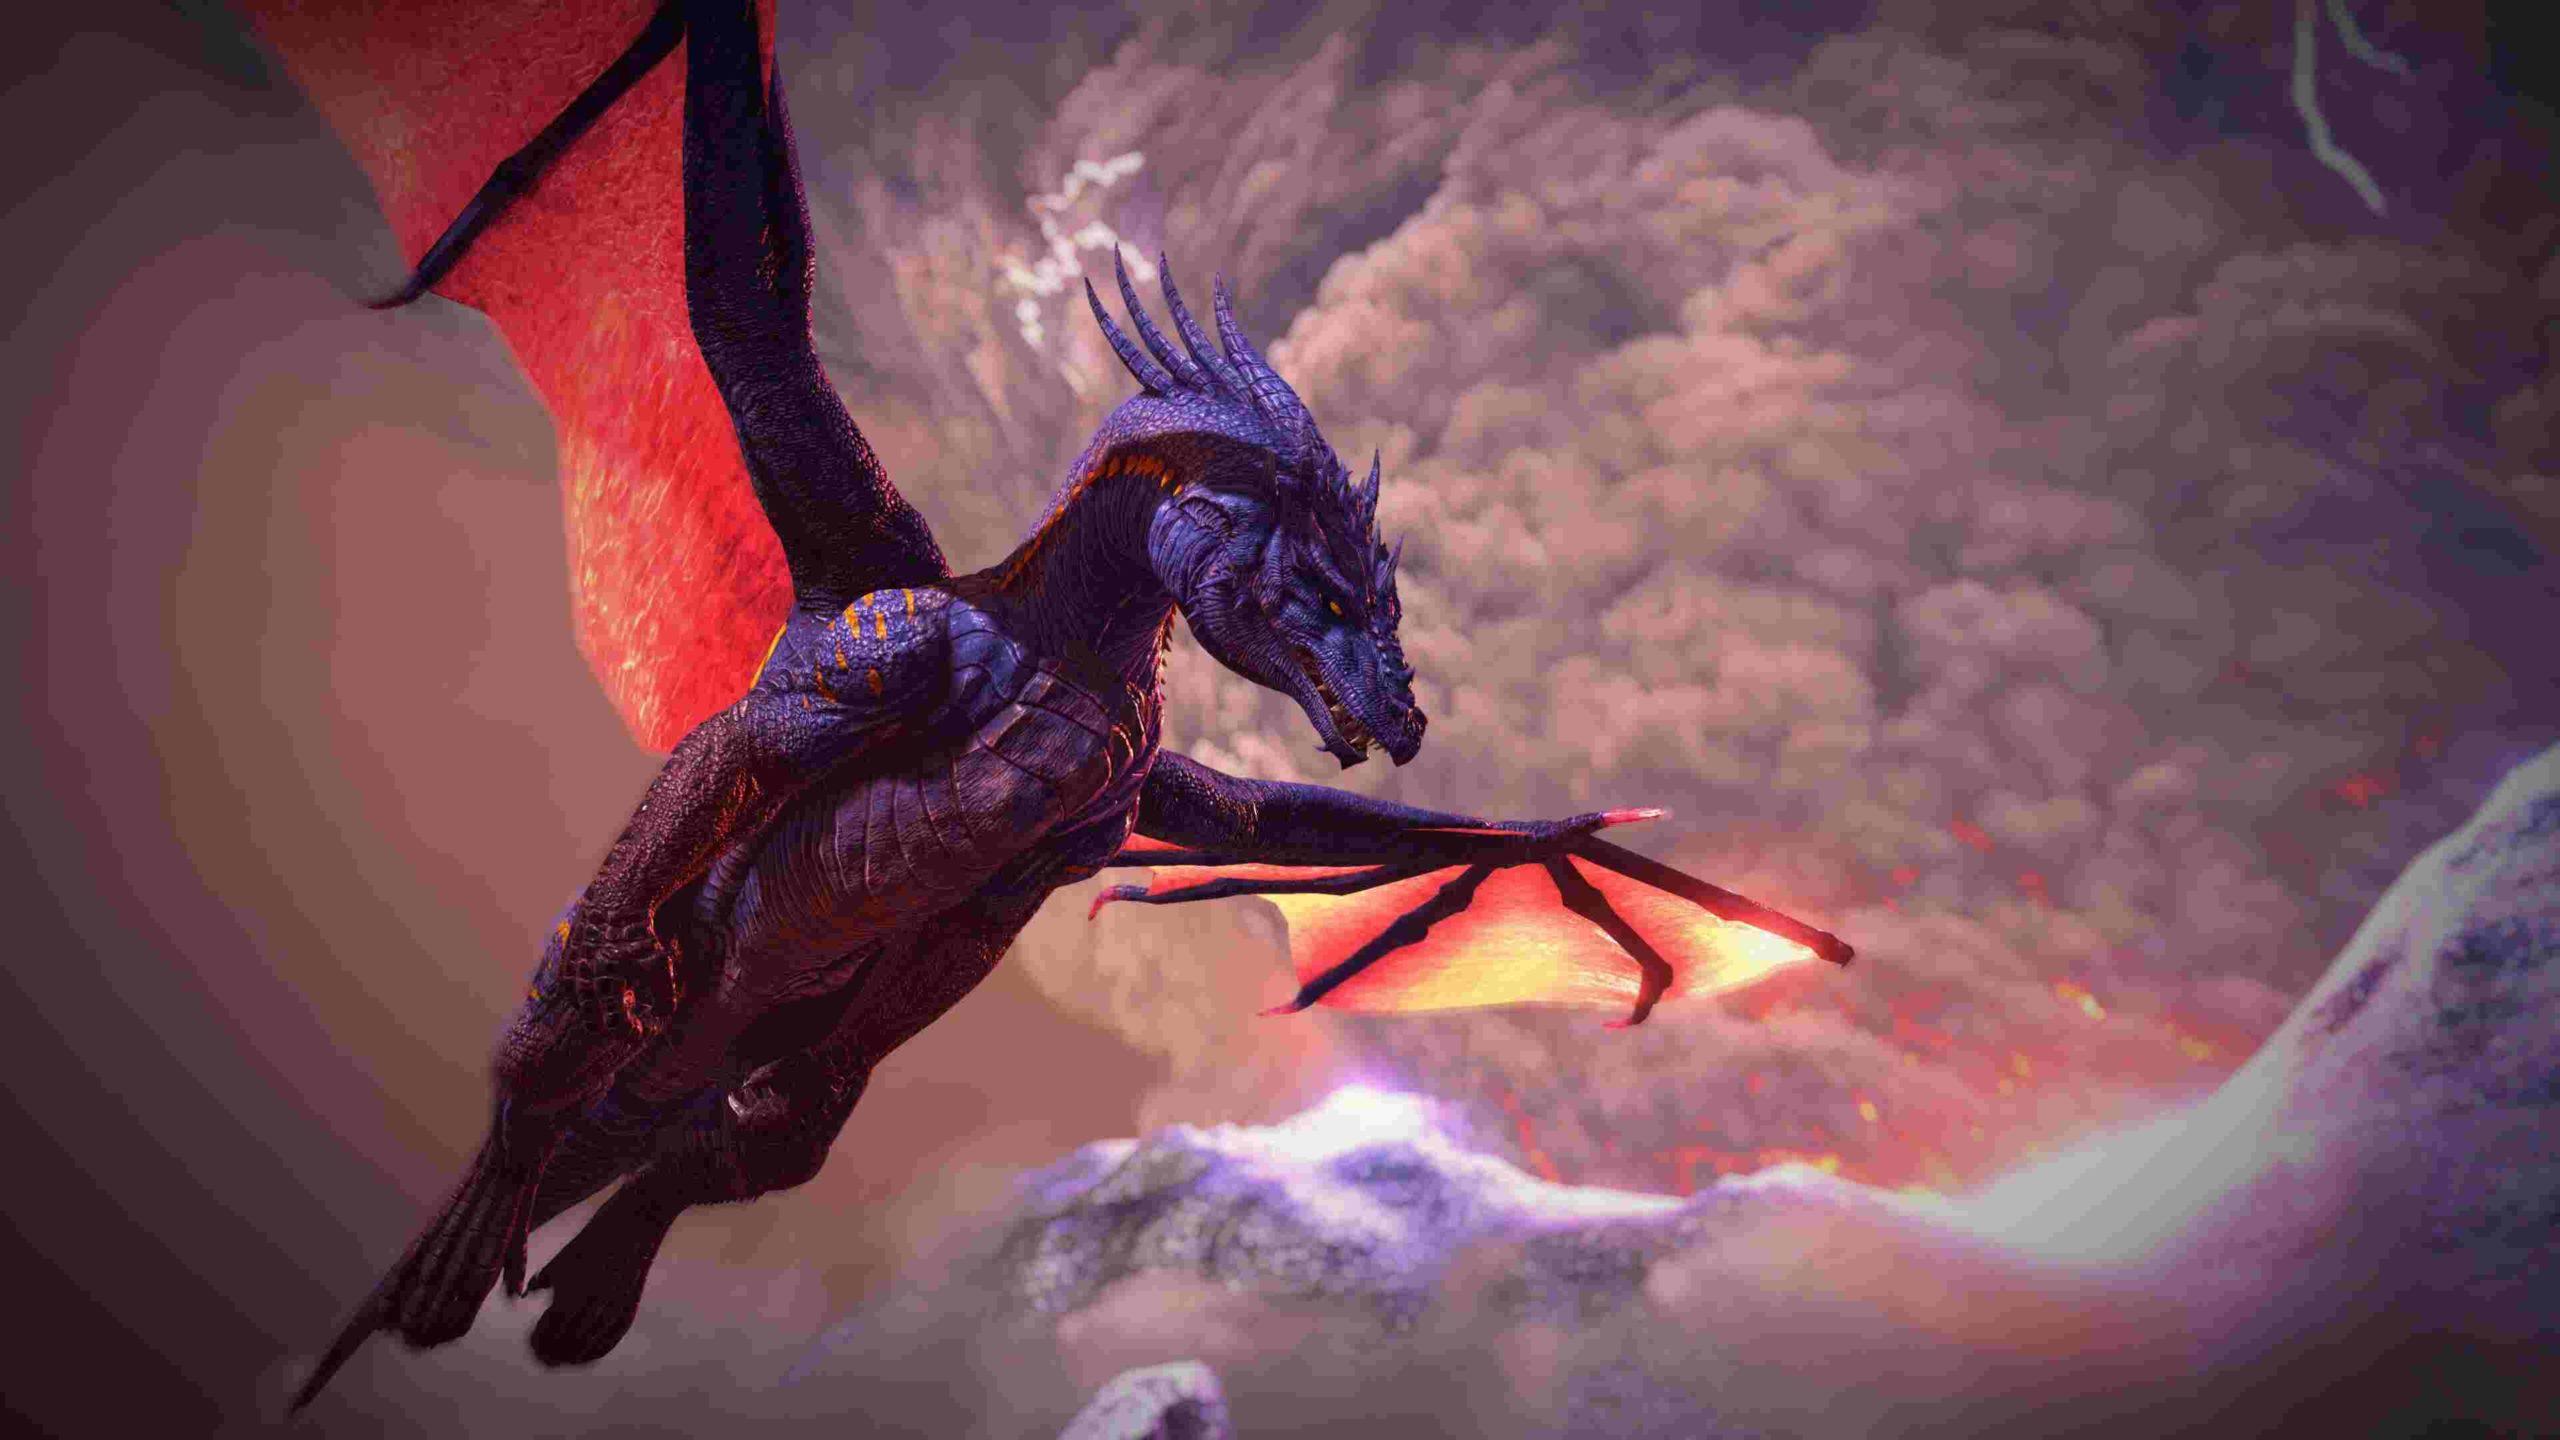 The Dragon ARK